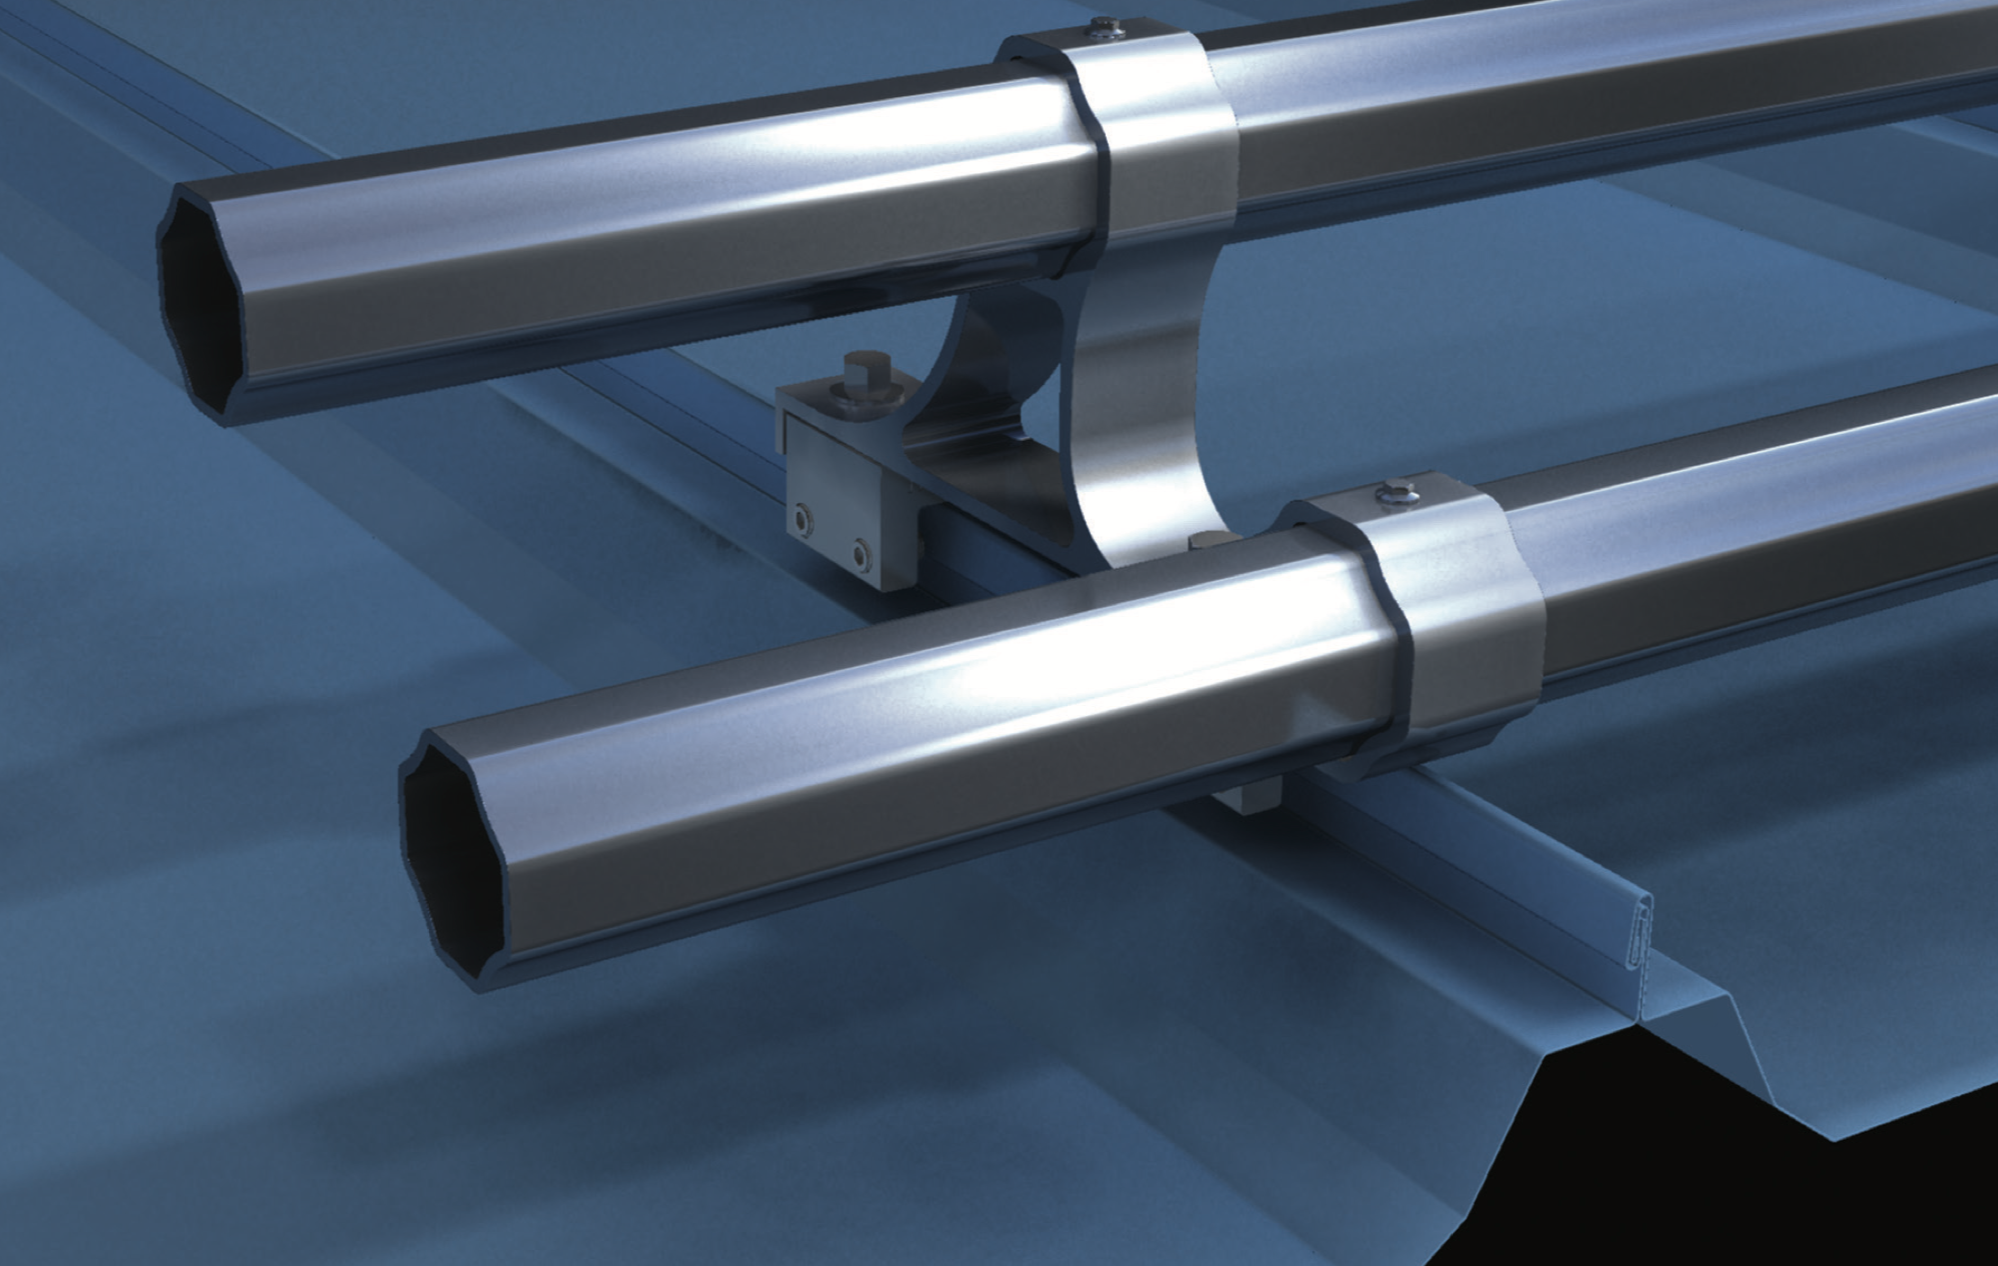 S-5!® X-Gard® 2.0 Snow Retention System